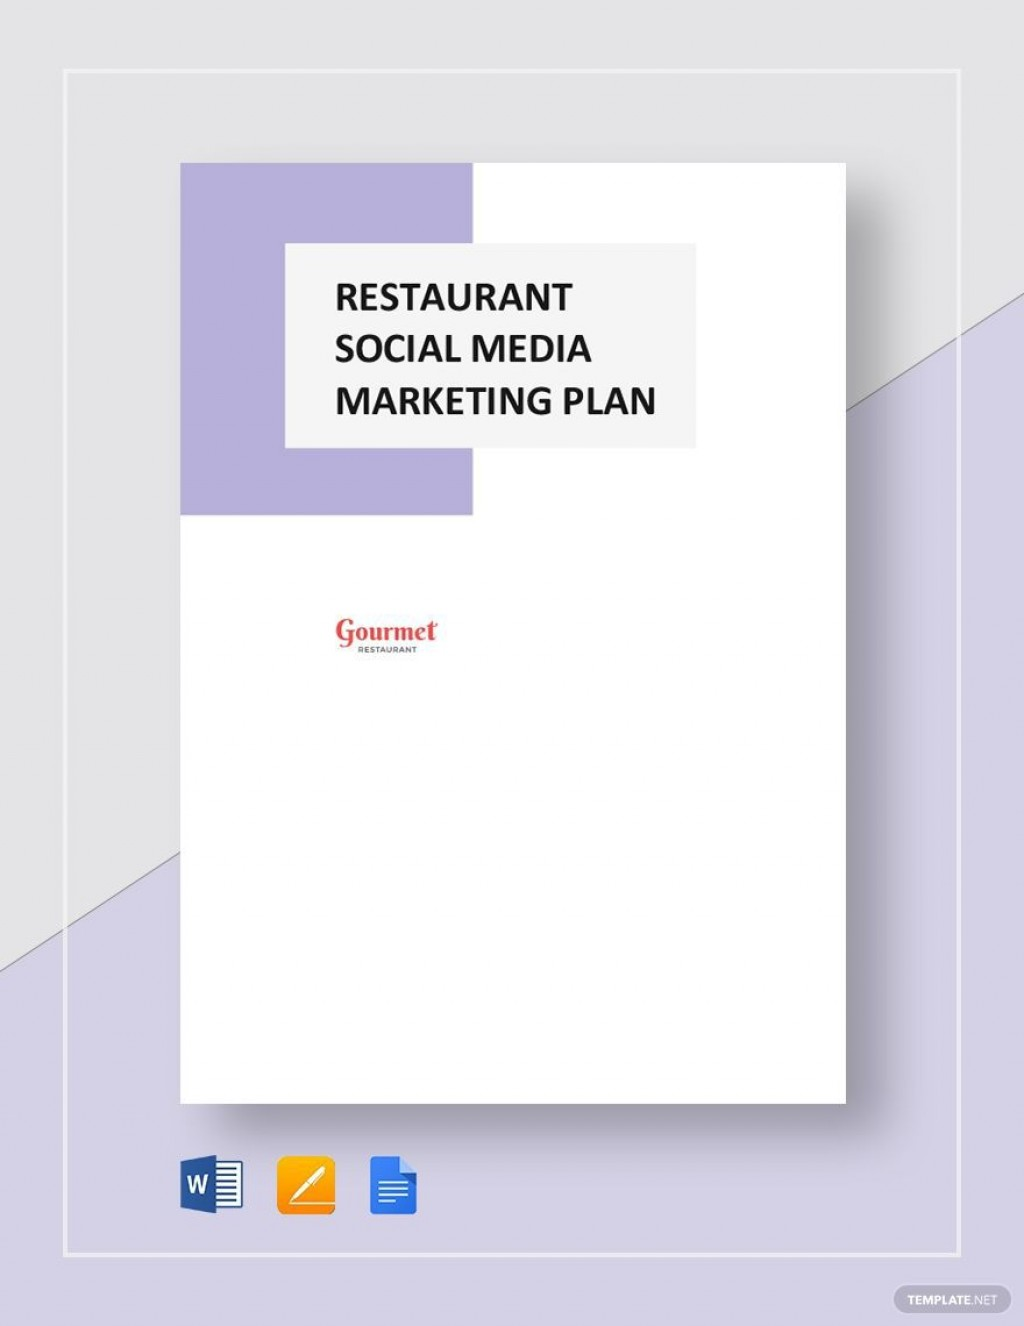 004 Impressive Social Media Marketing Plan Template Doc Highest Clarity Large